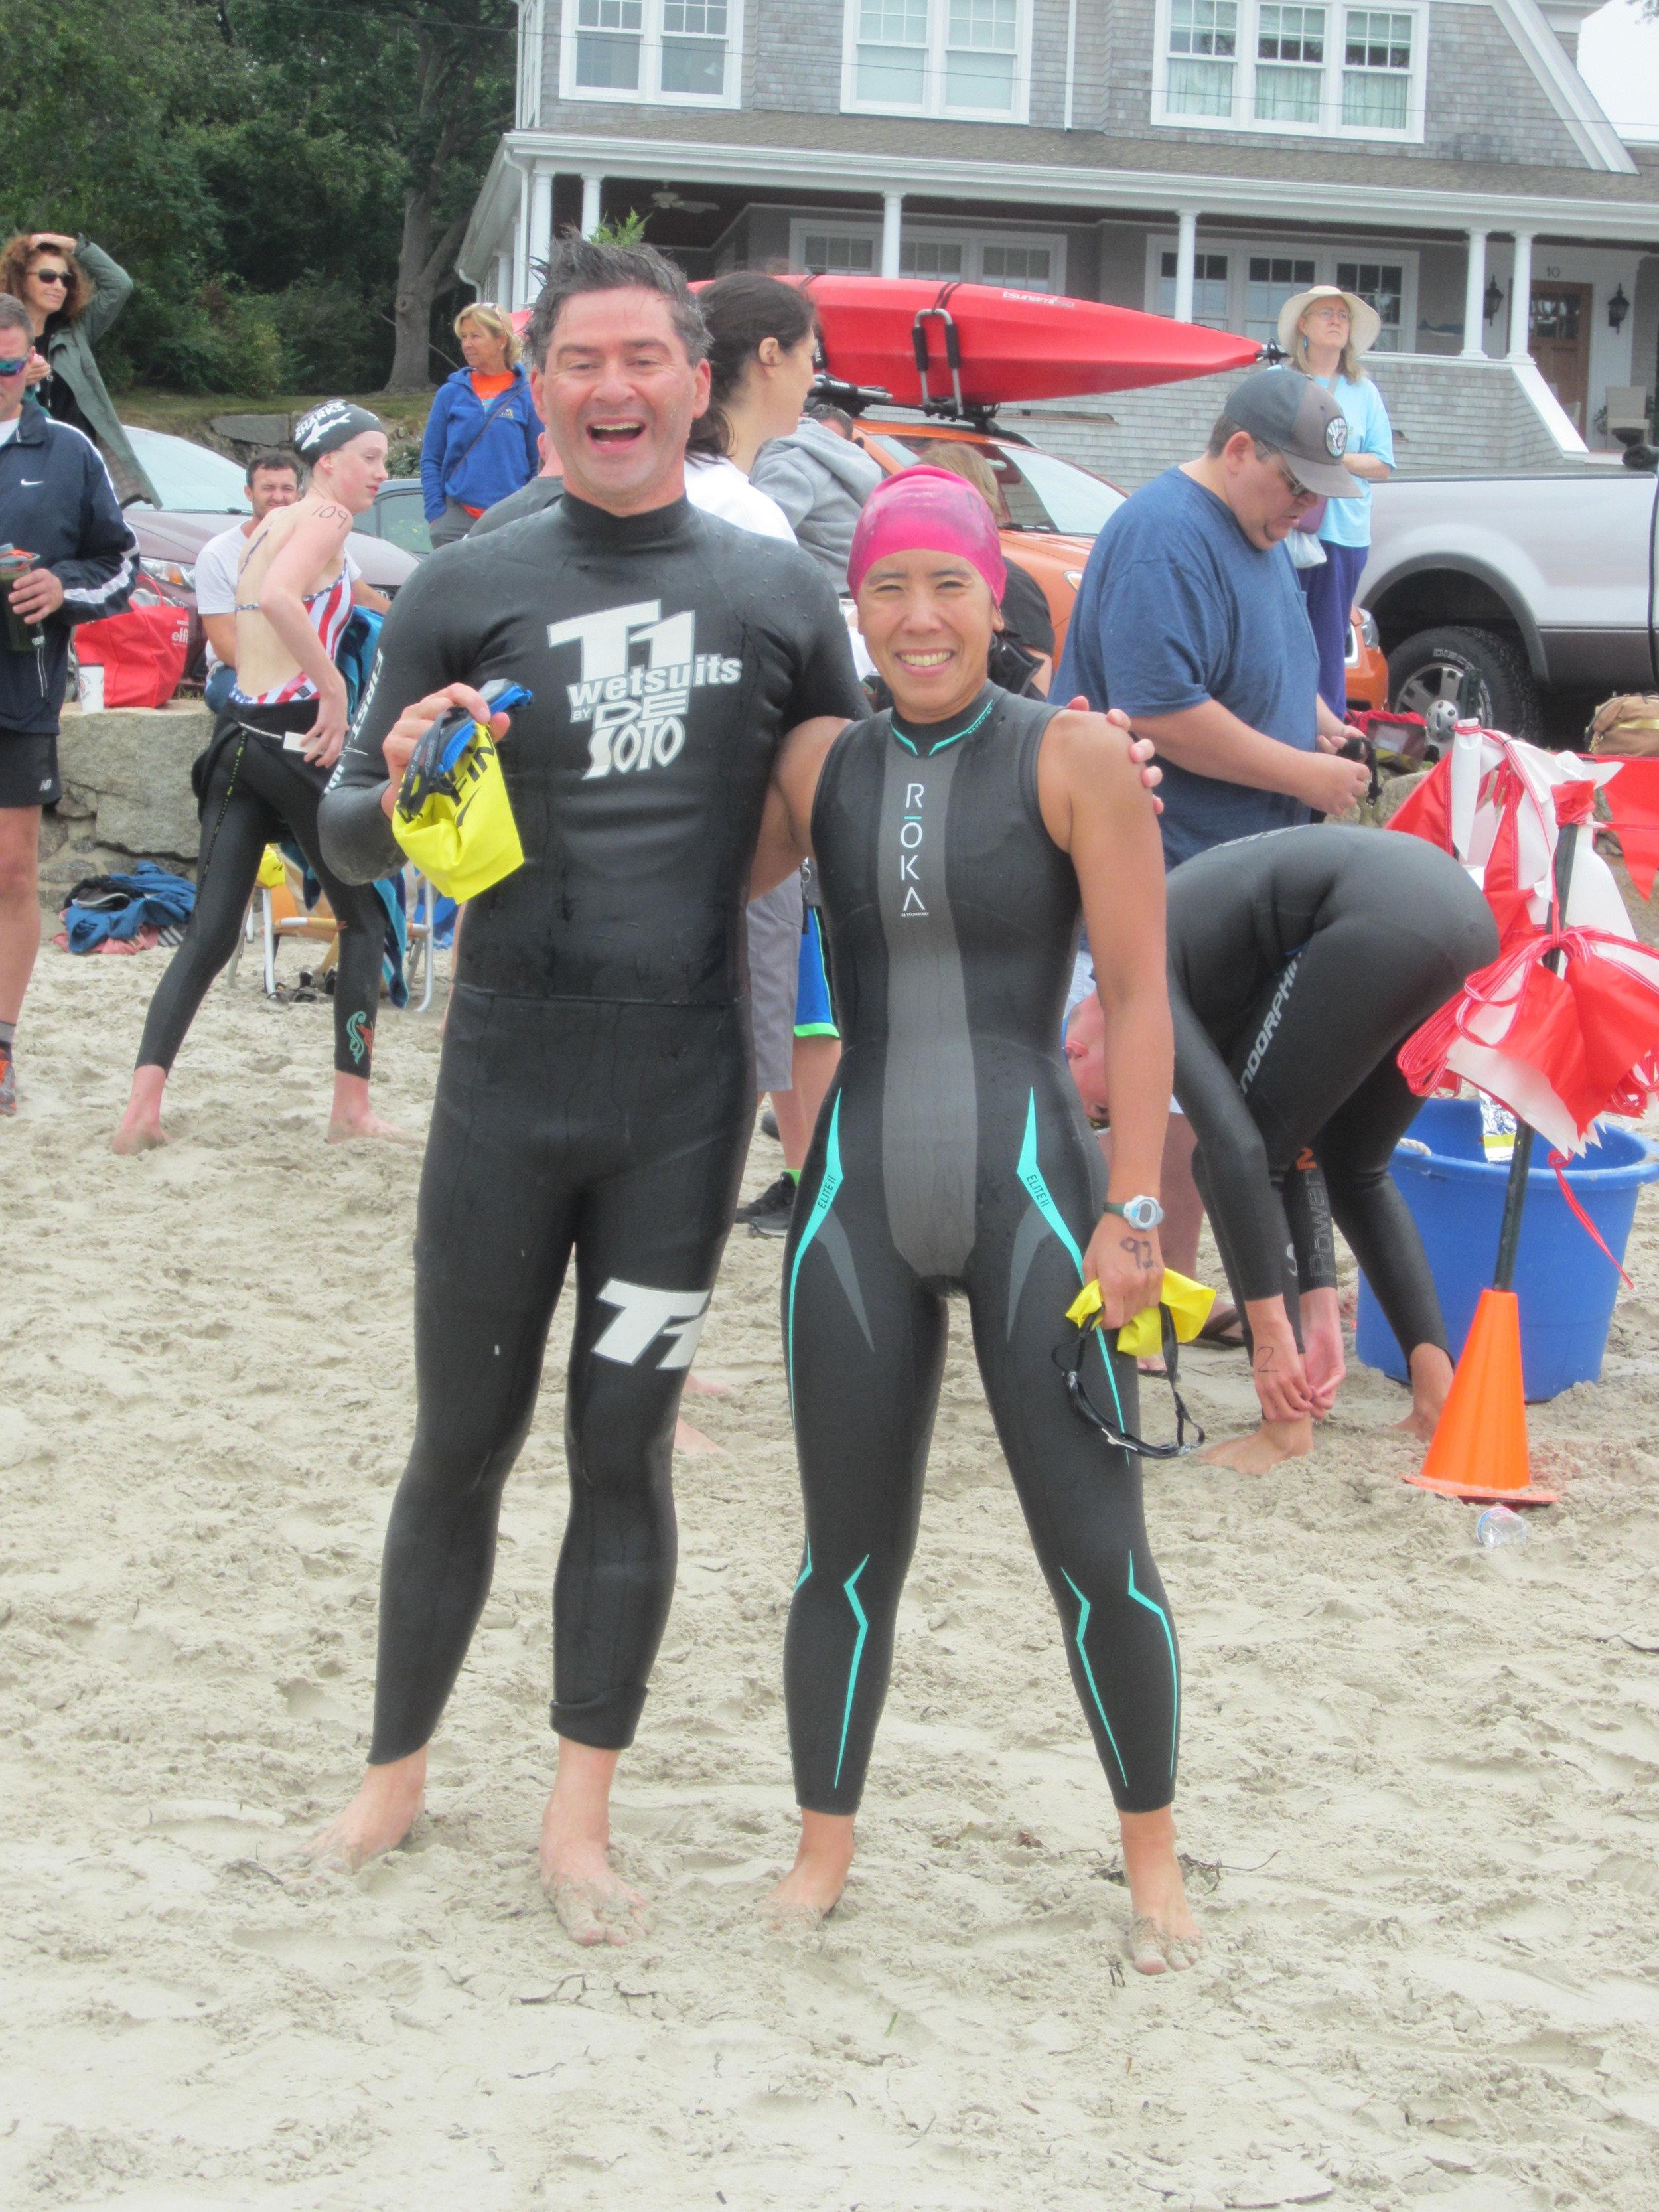 Charles River Masters swimmers David Bentley and Andrea Sonan